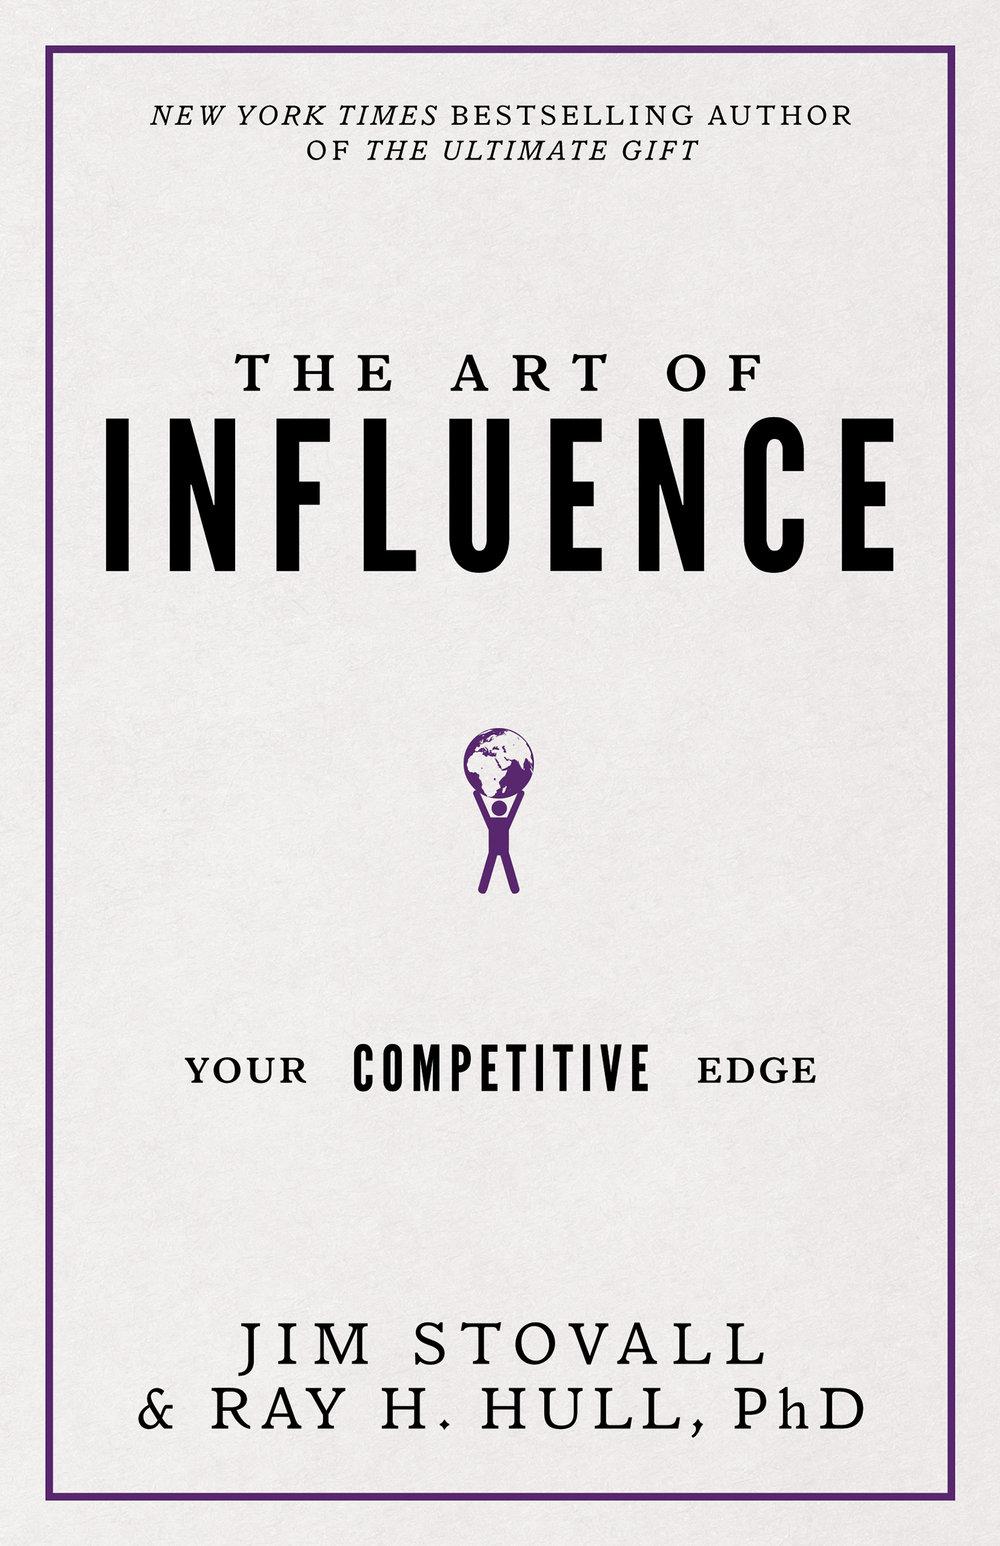 The_Art_of_Influence.jpg